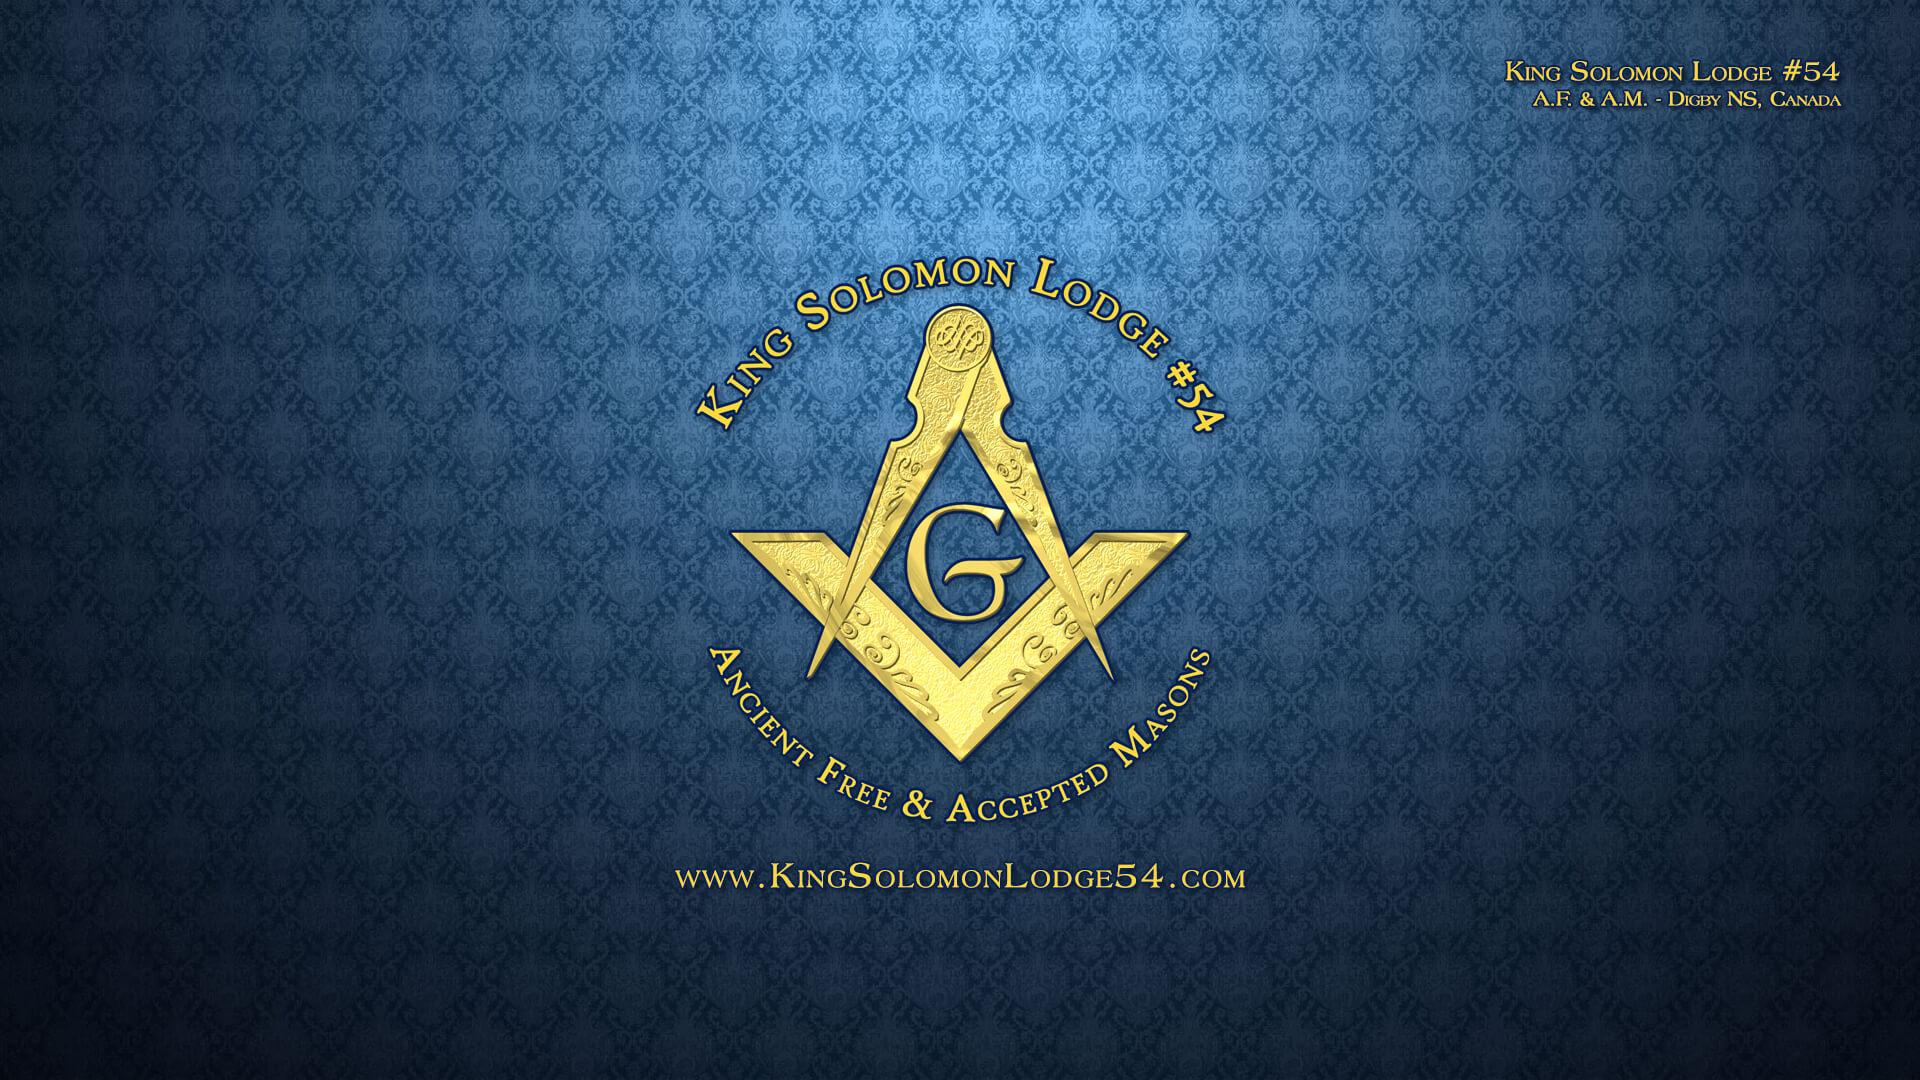 Photos King Solomon Lodge 54 1920x1080